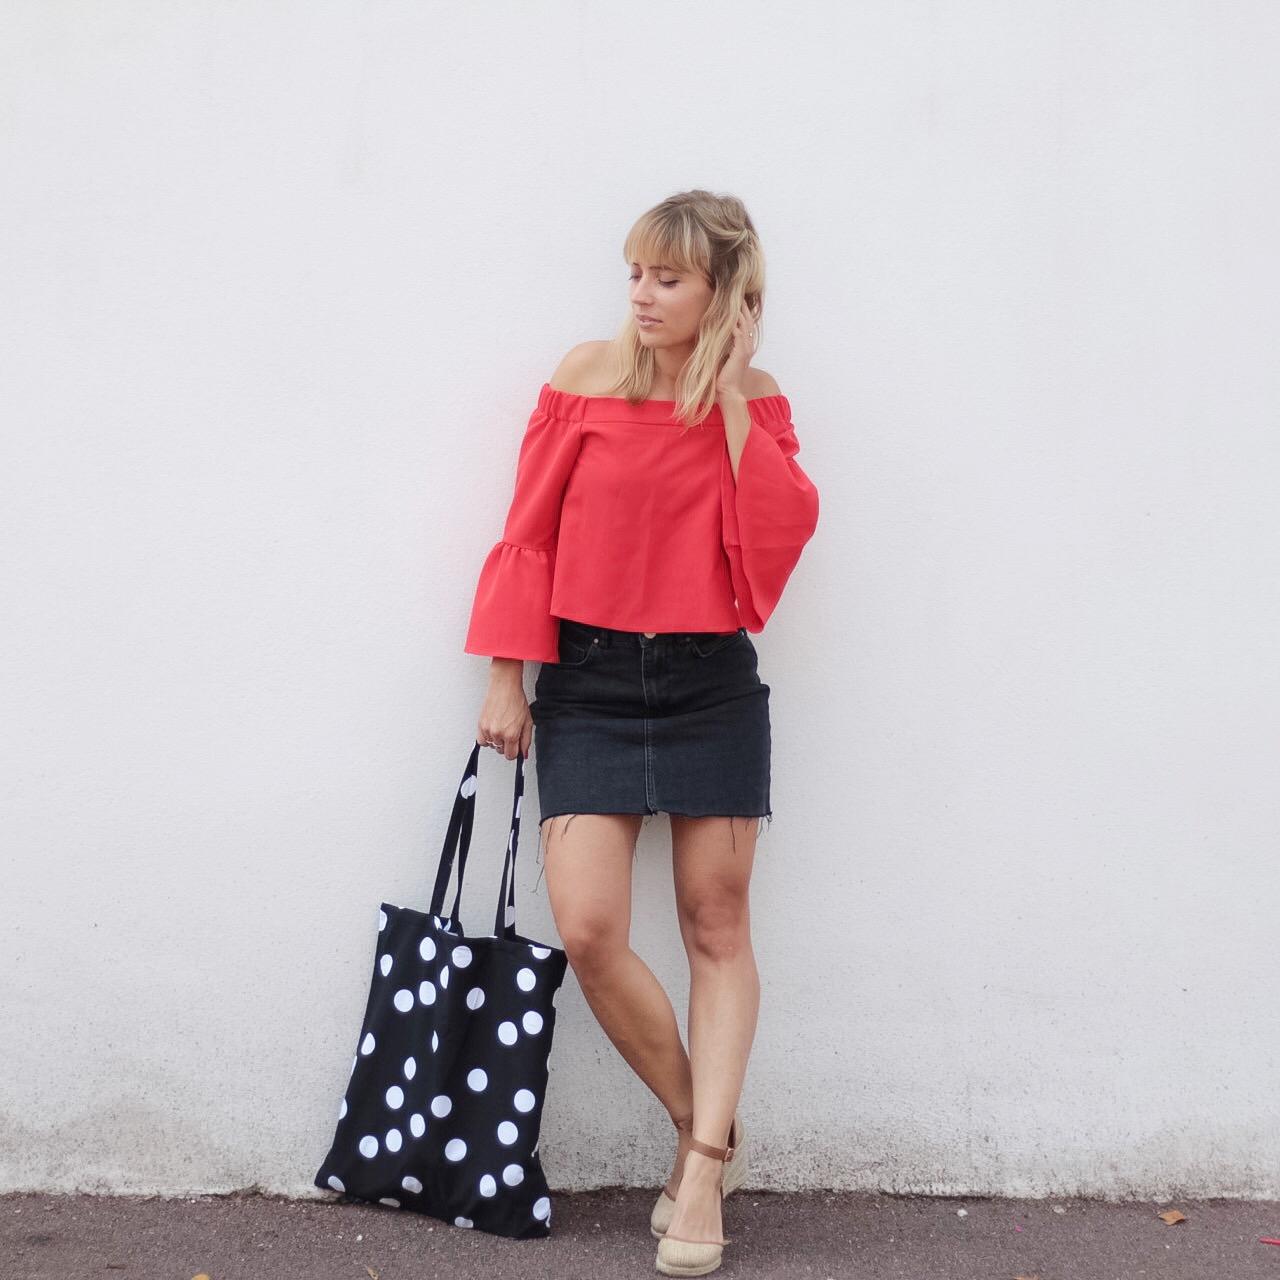 top-rouge-manches-evasees-jupe-en-jean-espadrilles-et-sac-a-poisi-sp4nkblog